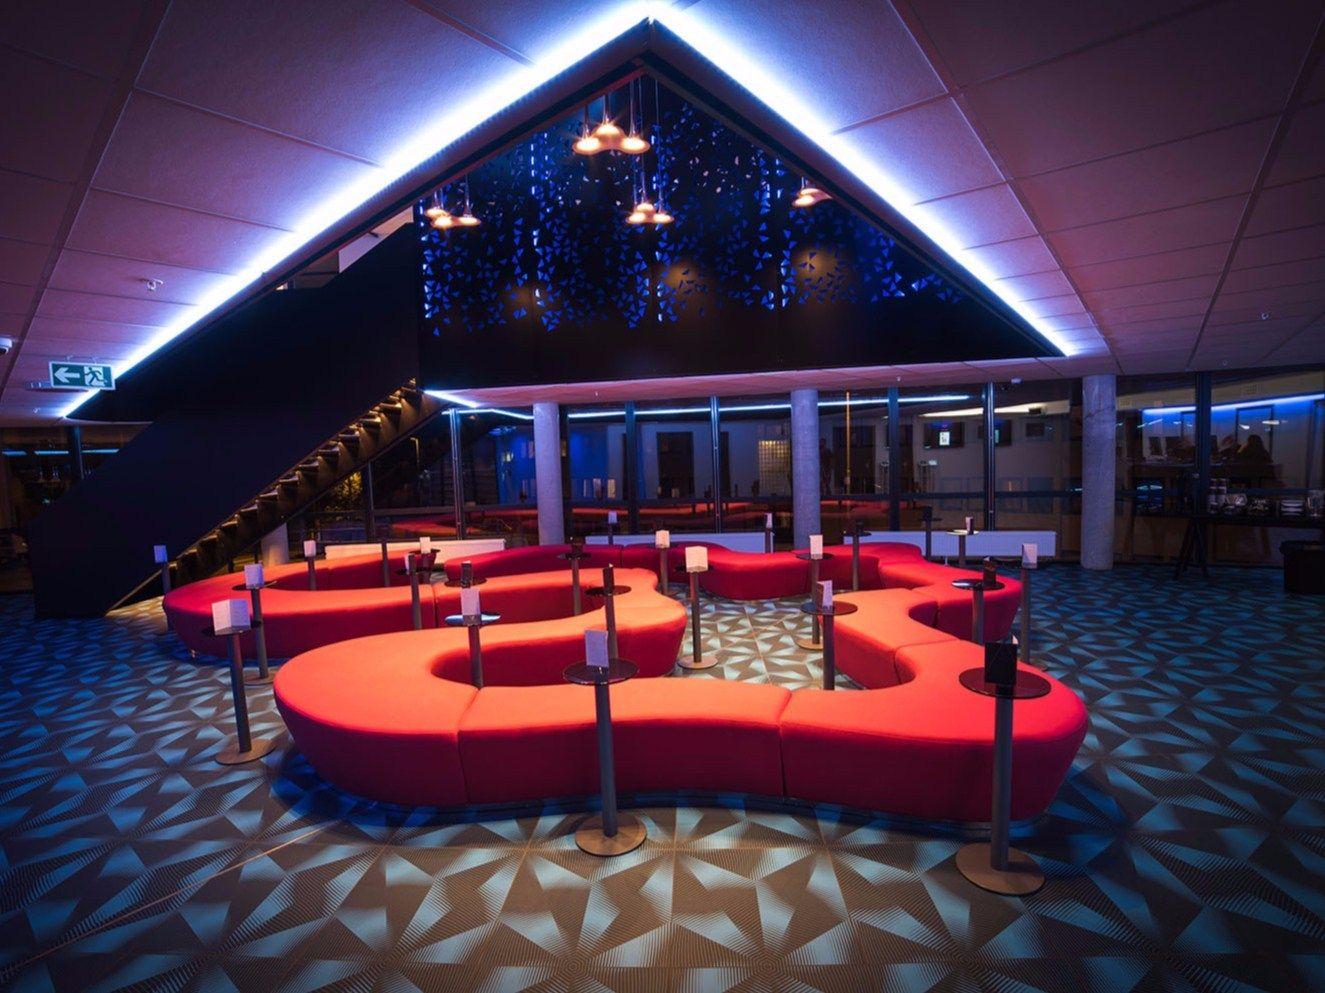 Axo Light Lights Up The New Magic Hotel In Bergen